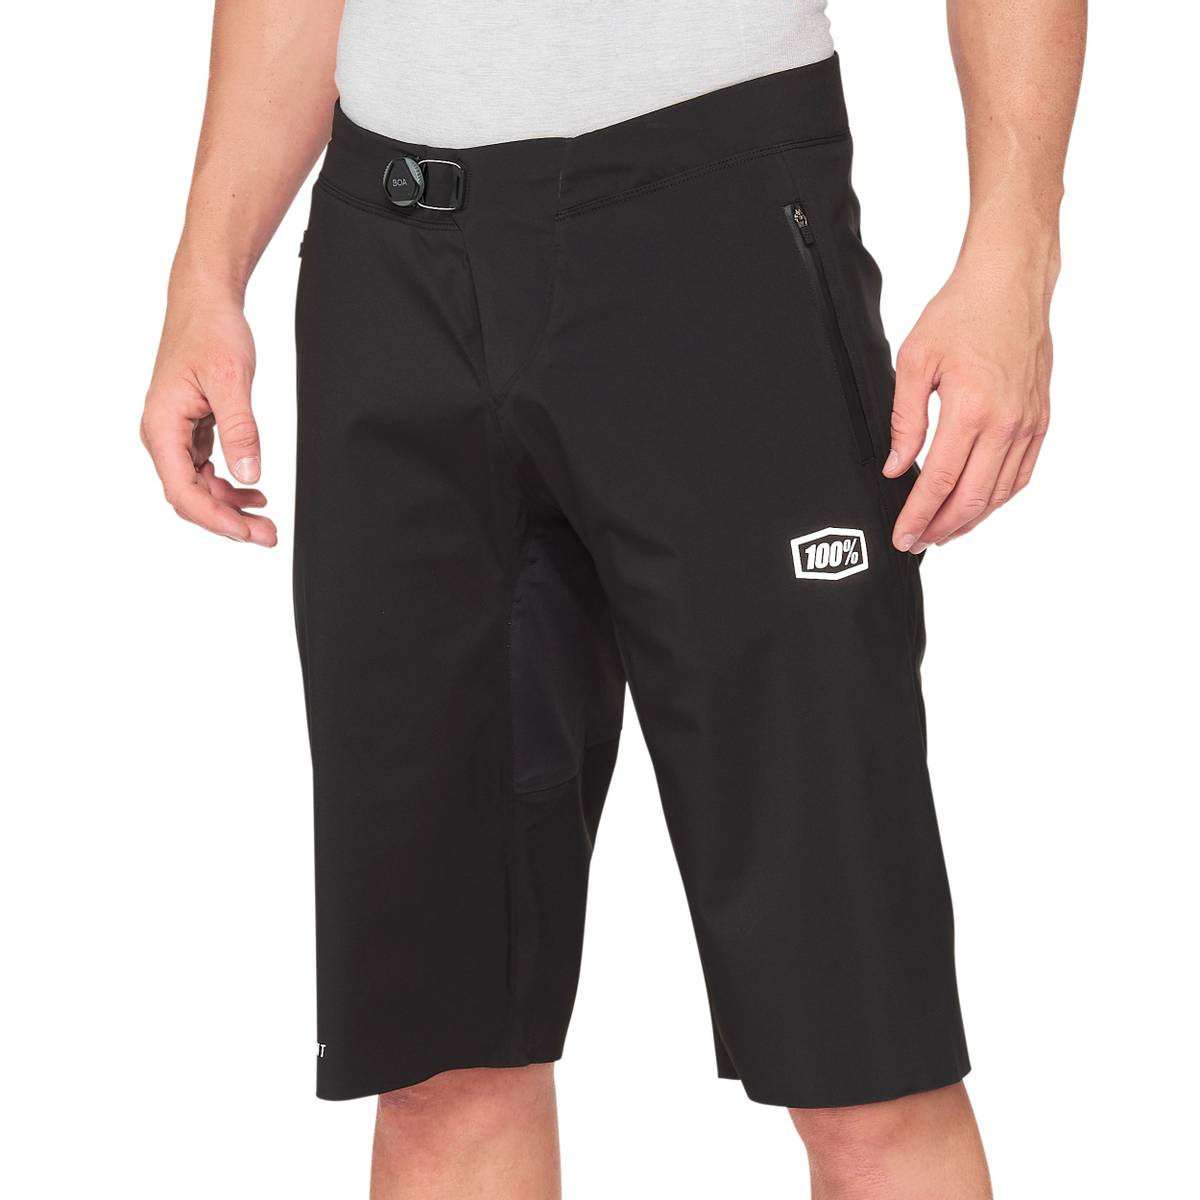 100% HYDROMATIC Shorts Black